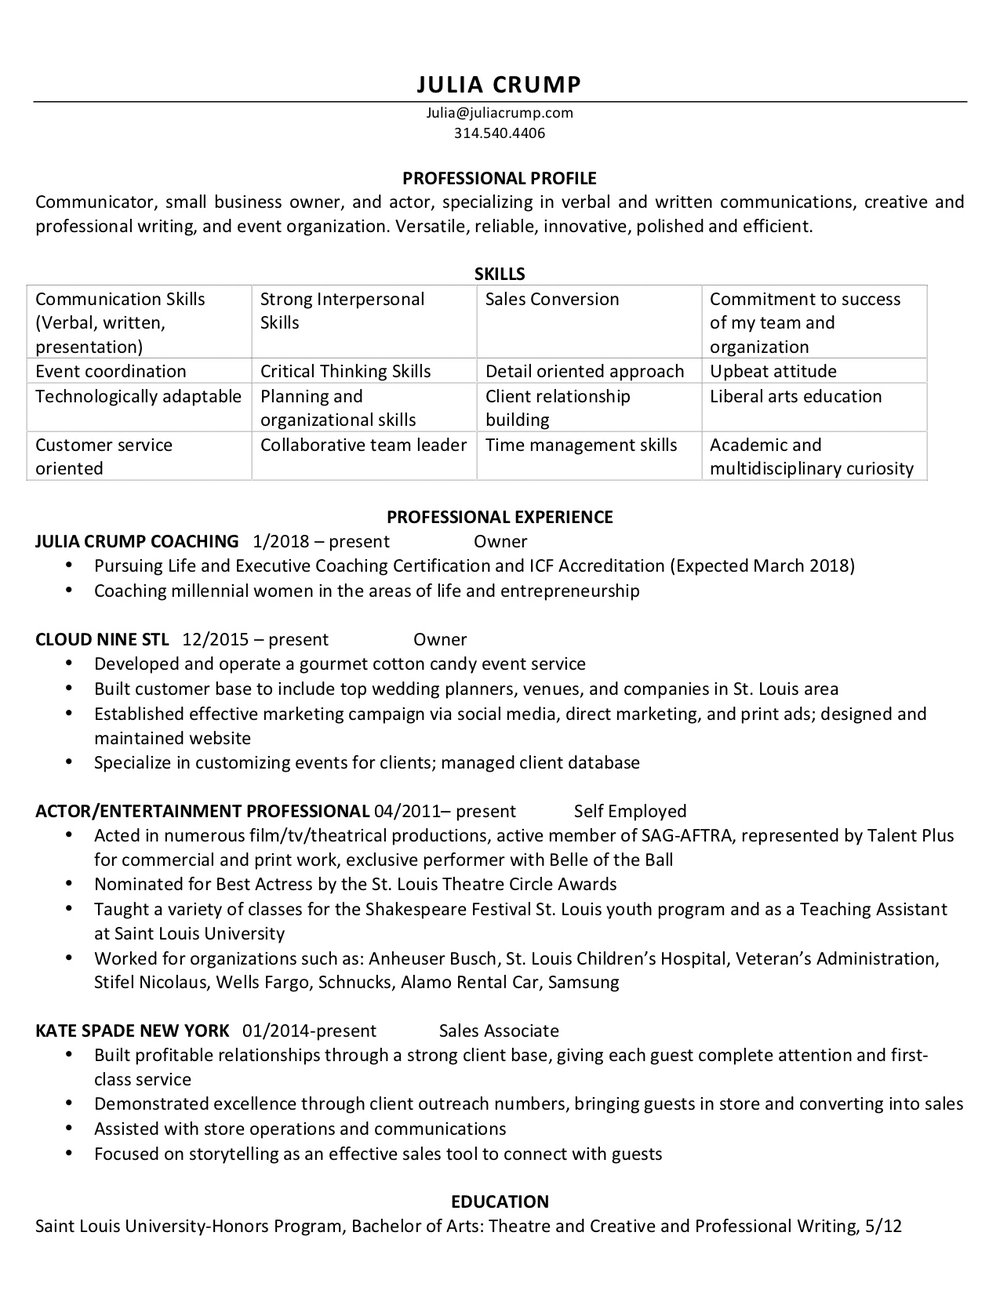 Julia Crump Resume.jpg